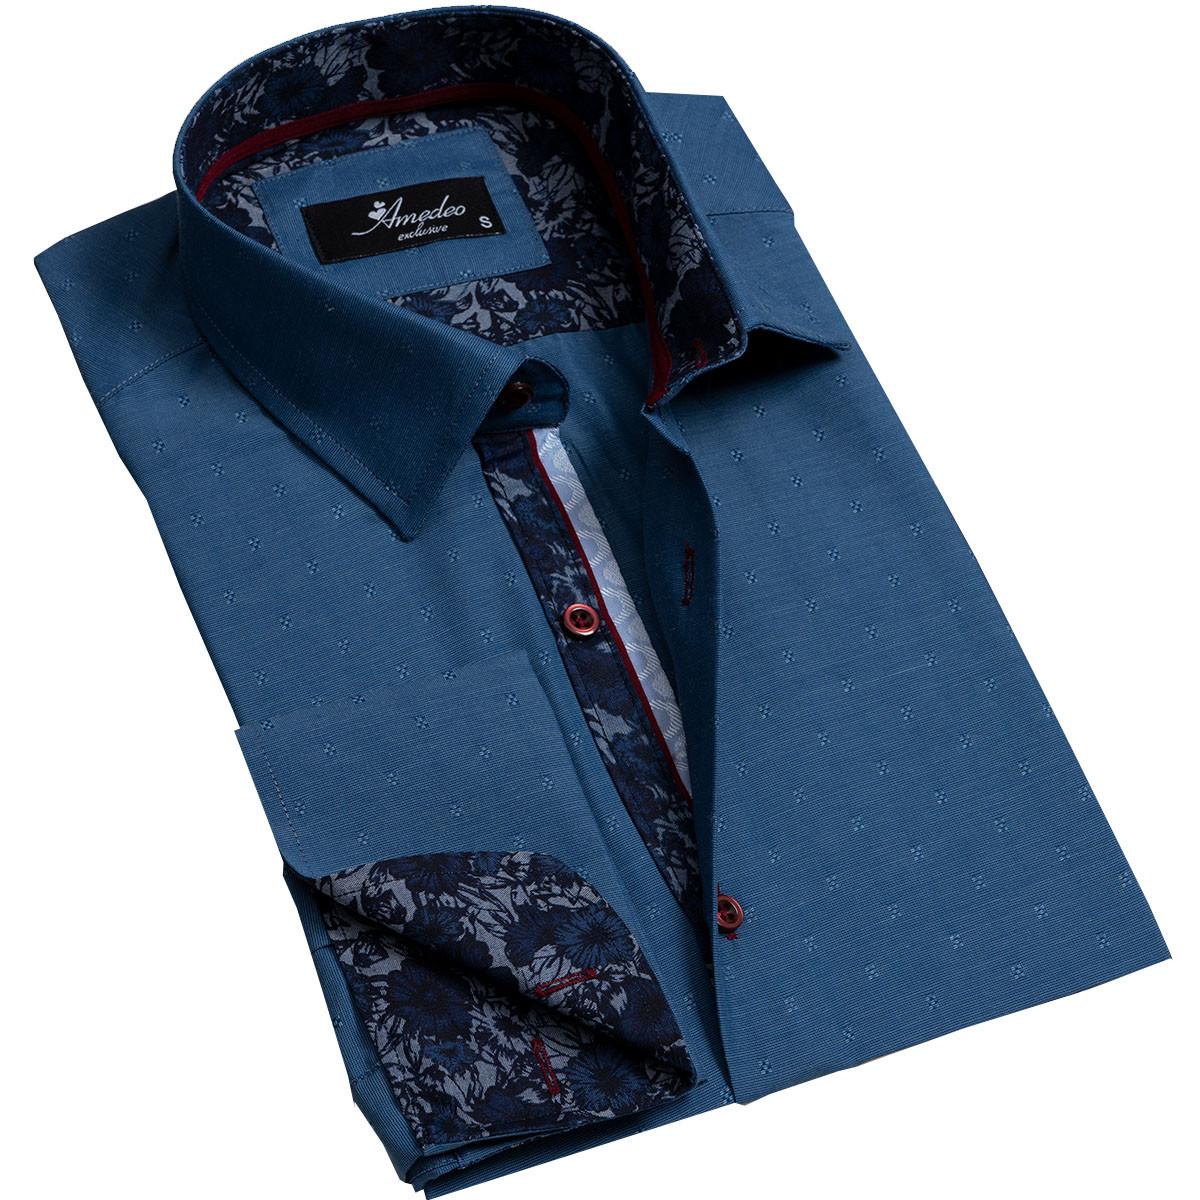 European Made & Designed Reversible Cuff Premium French Cuff Dress Shirt - textured blue